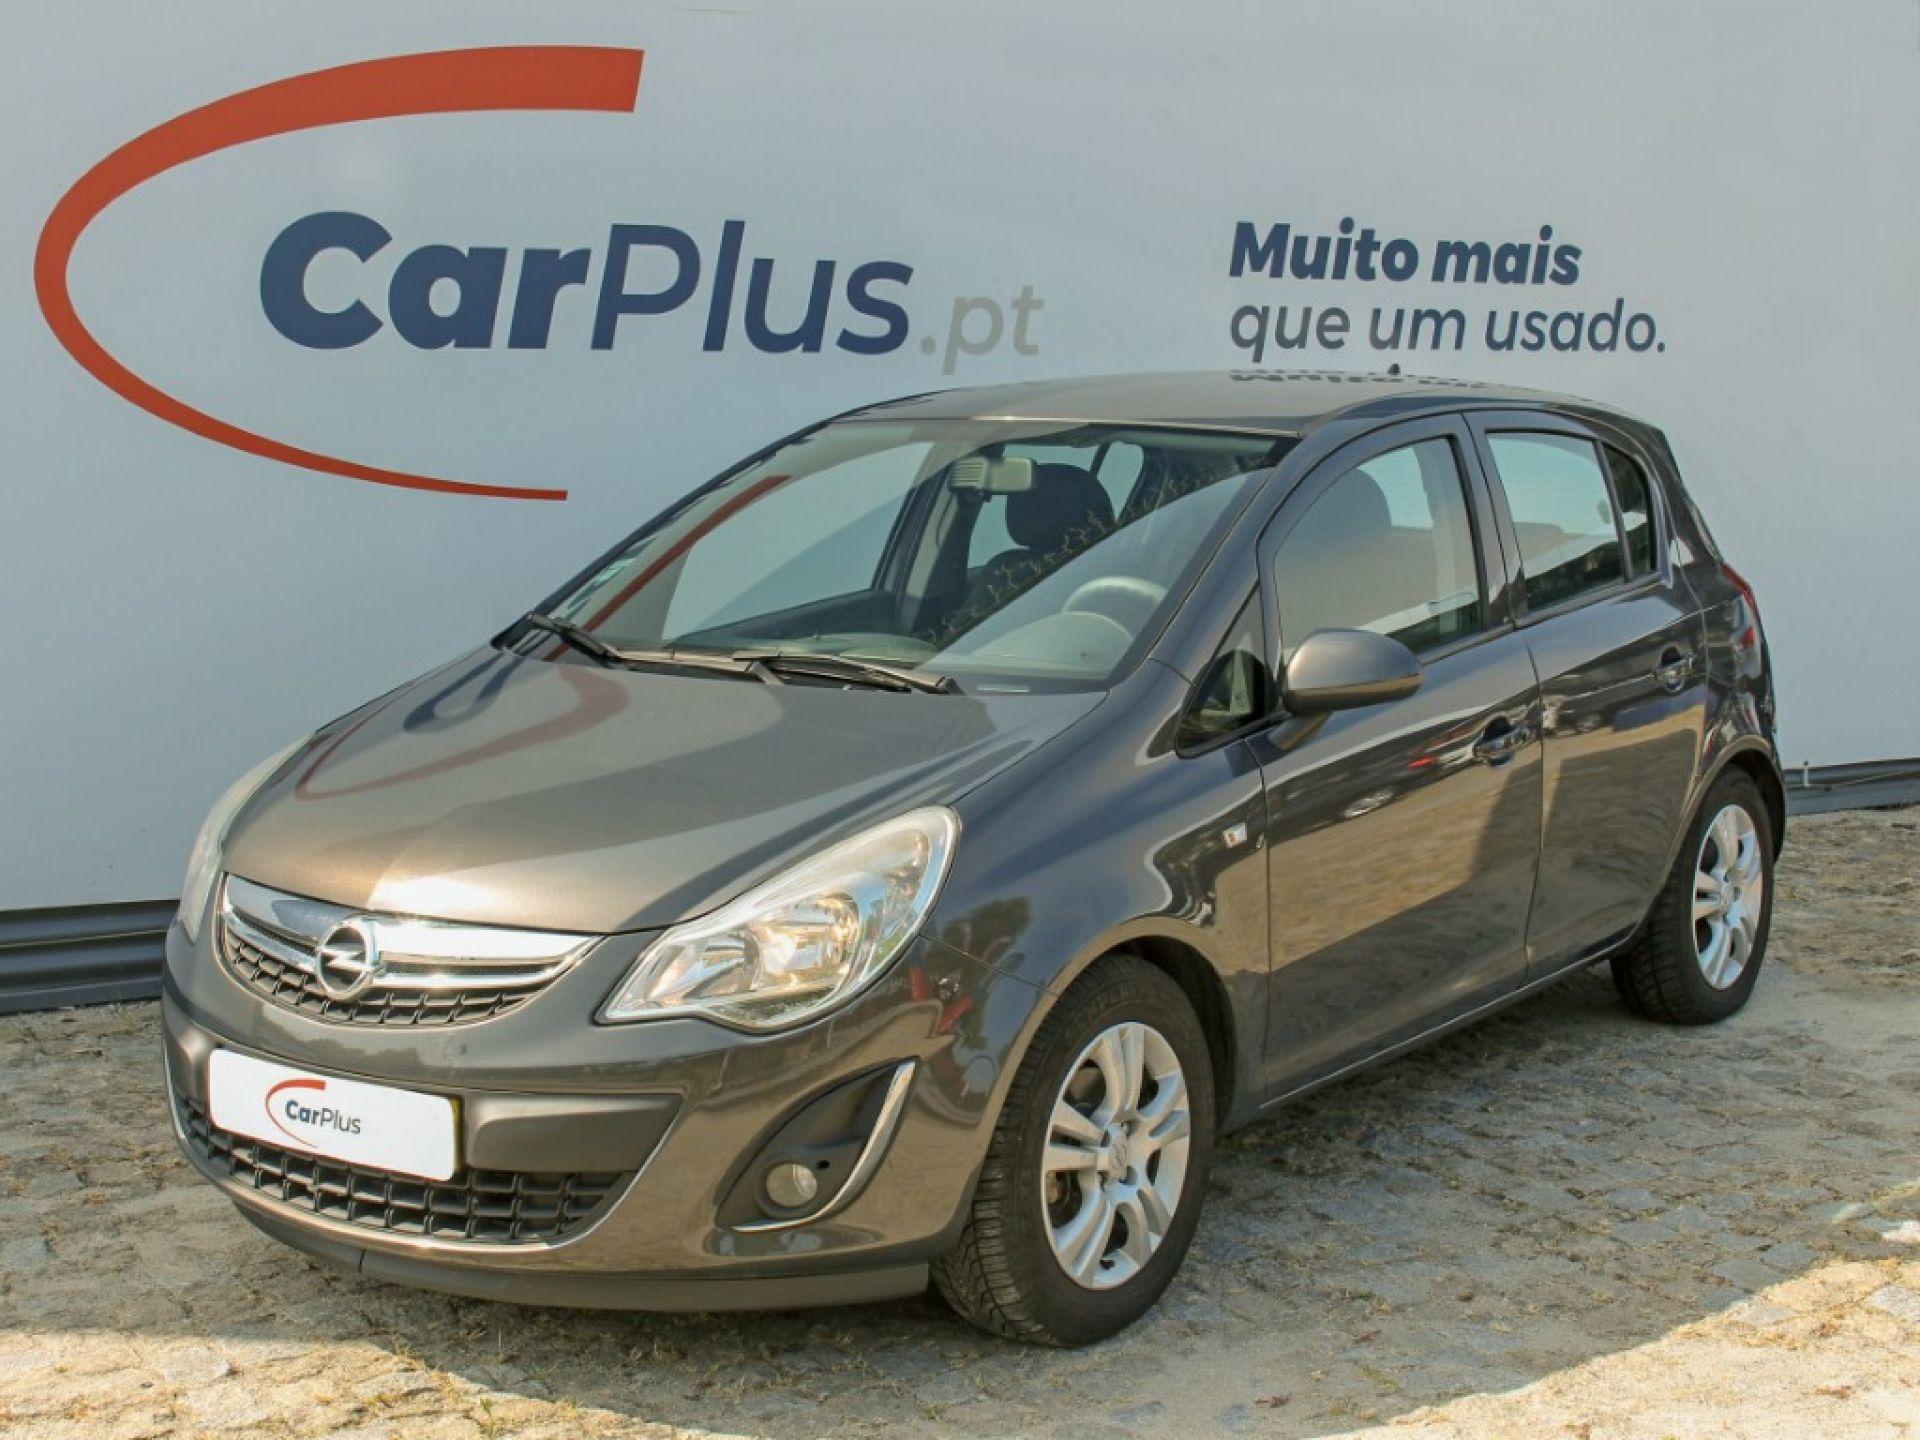 Opel Corsa 1.3 CDTI 95cv ecoFLEX SEnjoy segunda mão Porto